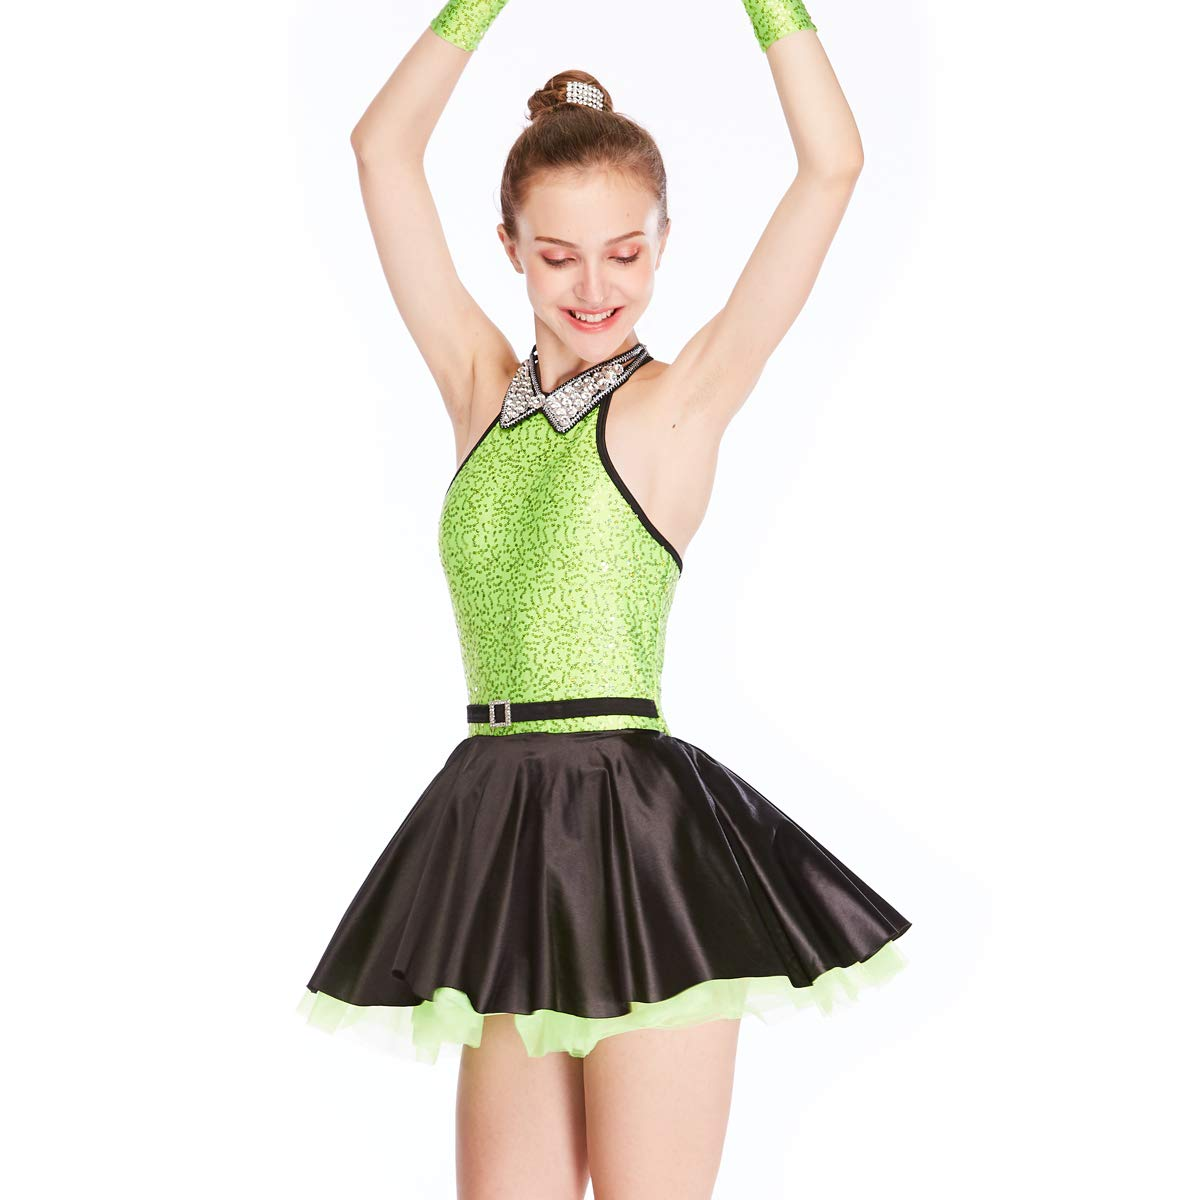 MiDee Jazz Dress Dance Costume High Neck with Sparkle Austria Rhinestones Collar (LA, AppleGreen) by MiDee